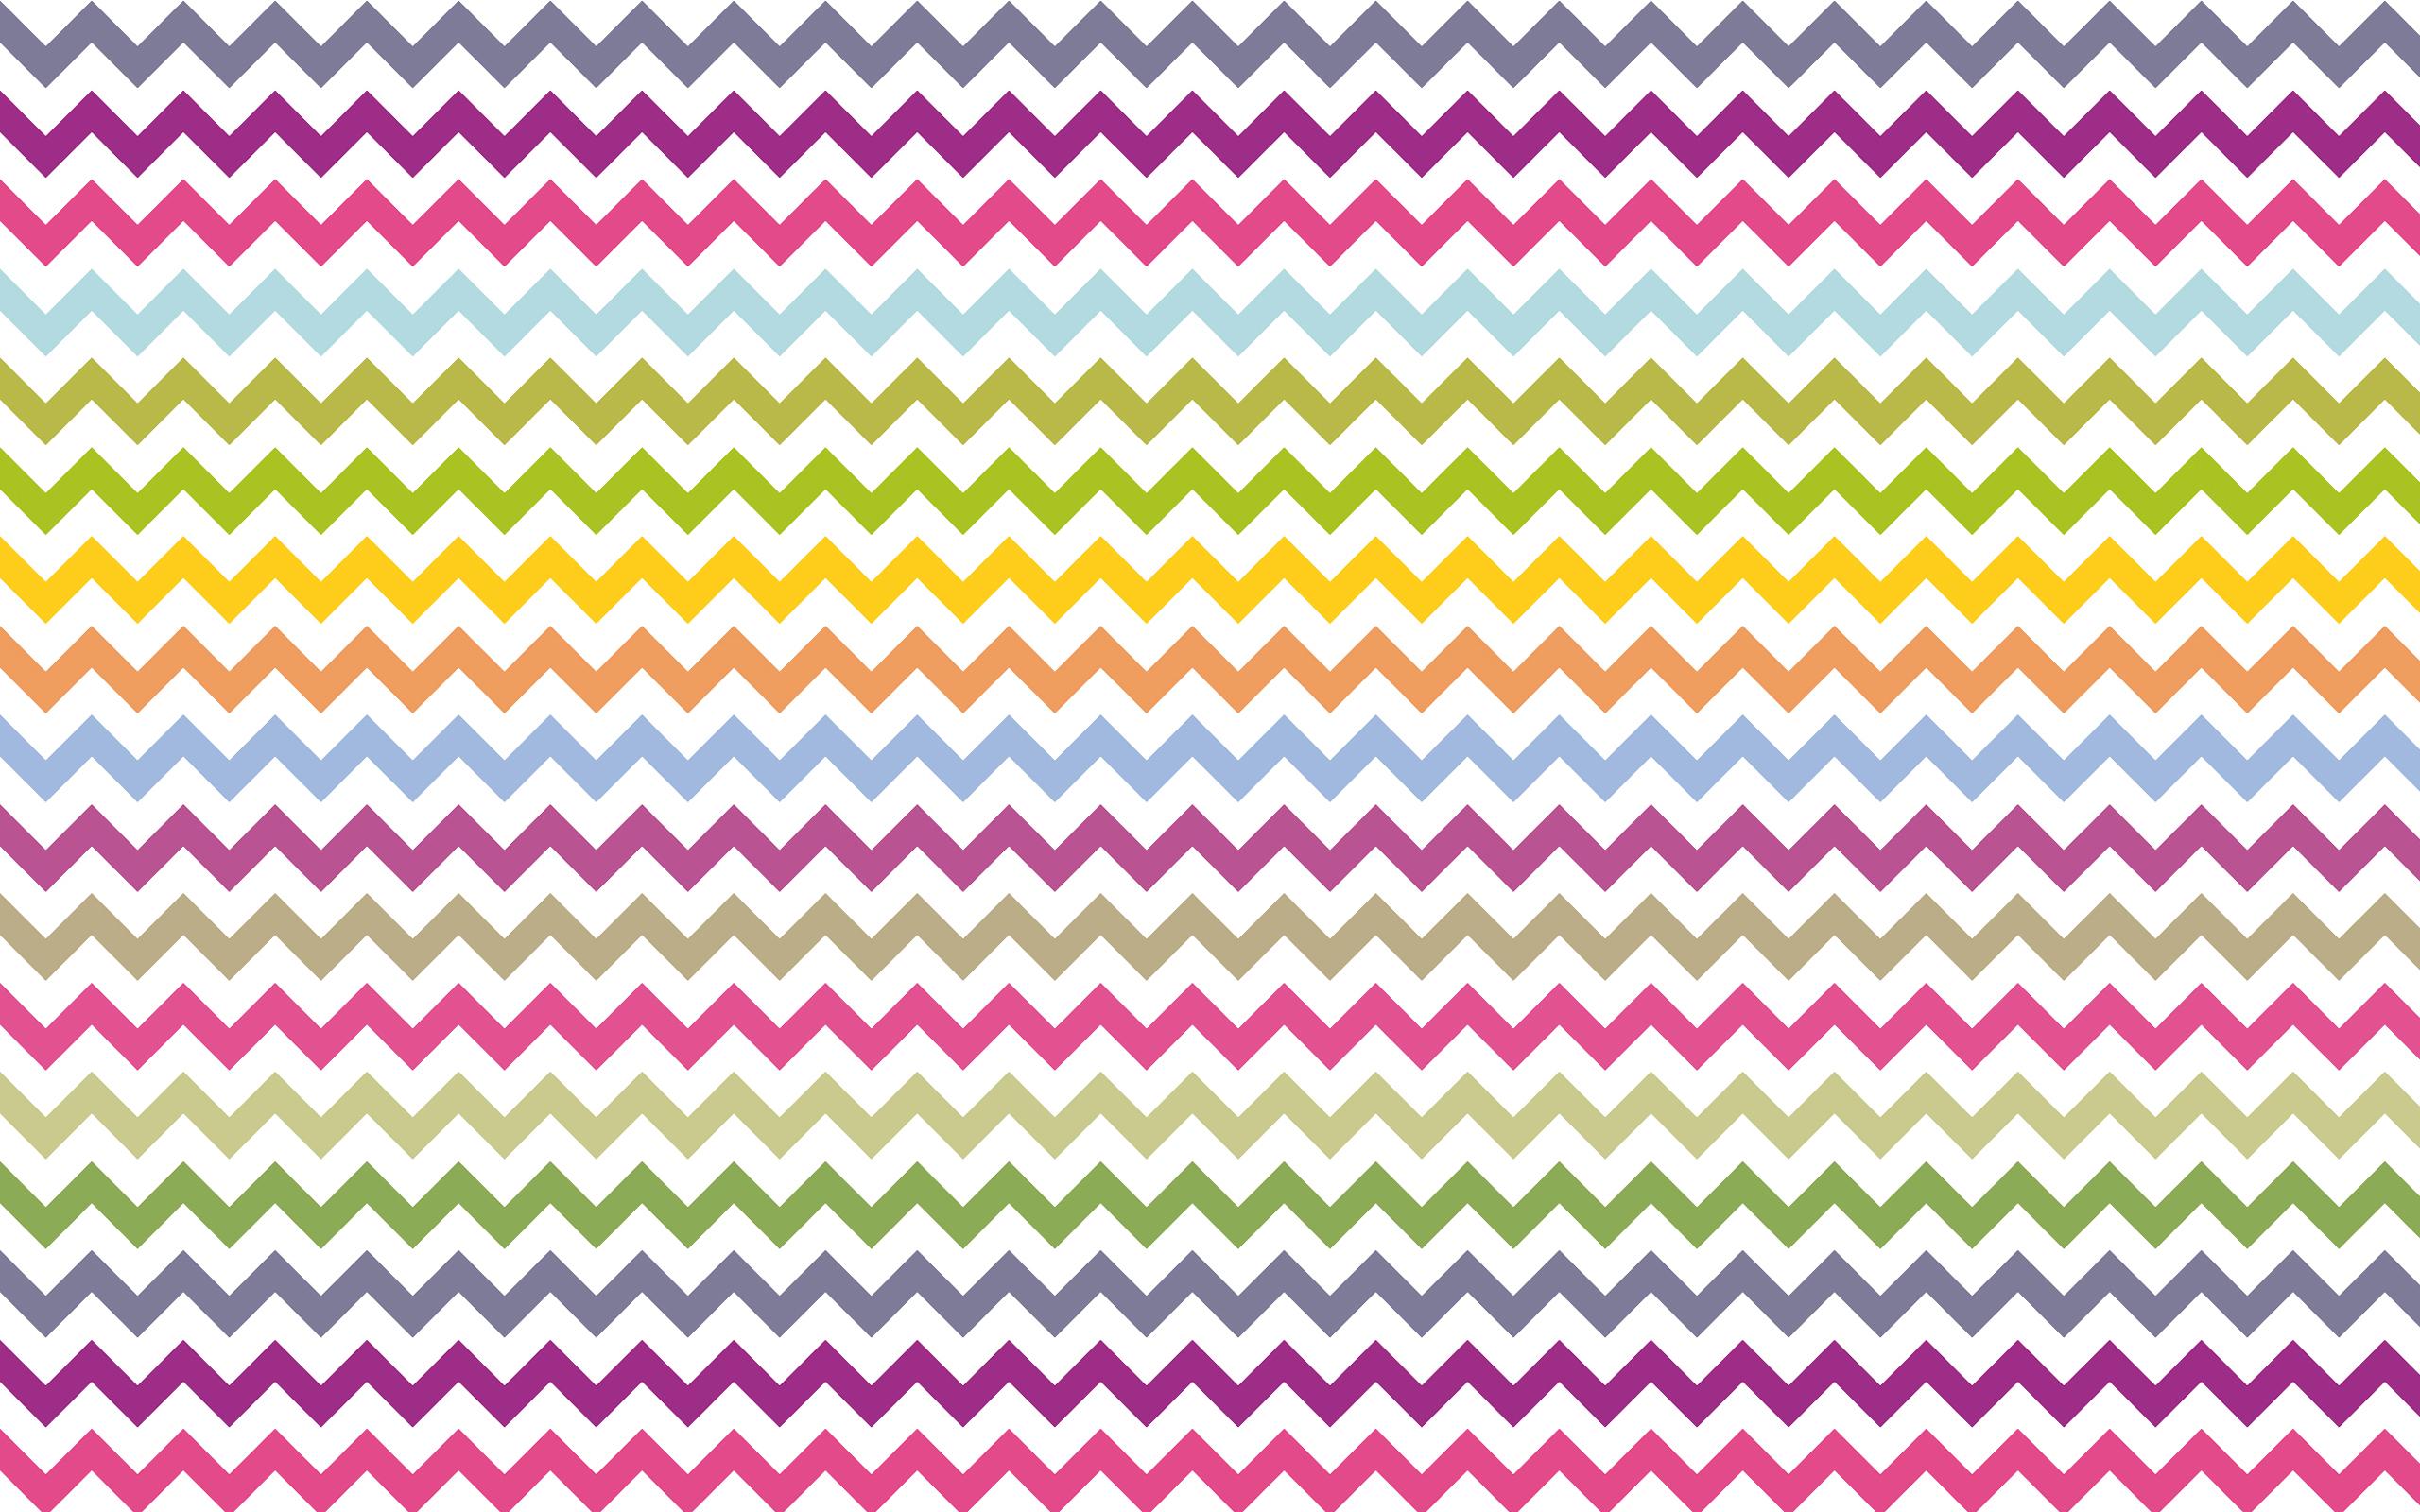 cute pattern wallpaper 2H | wallpapertp